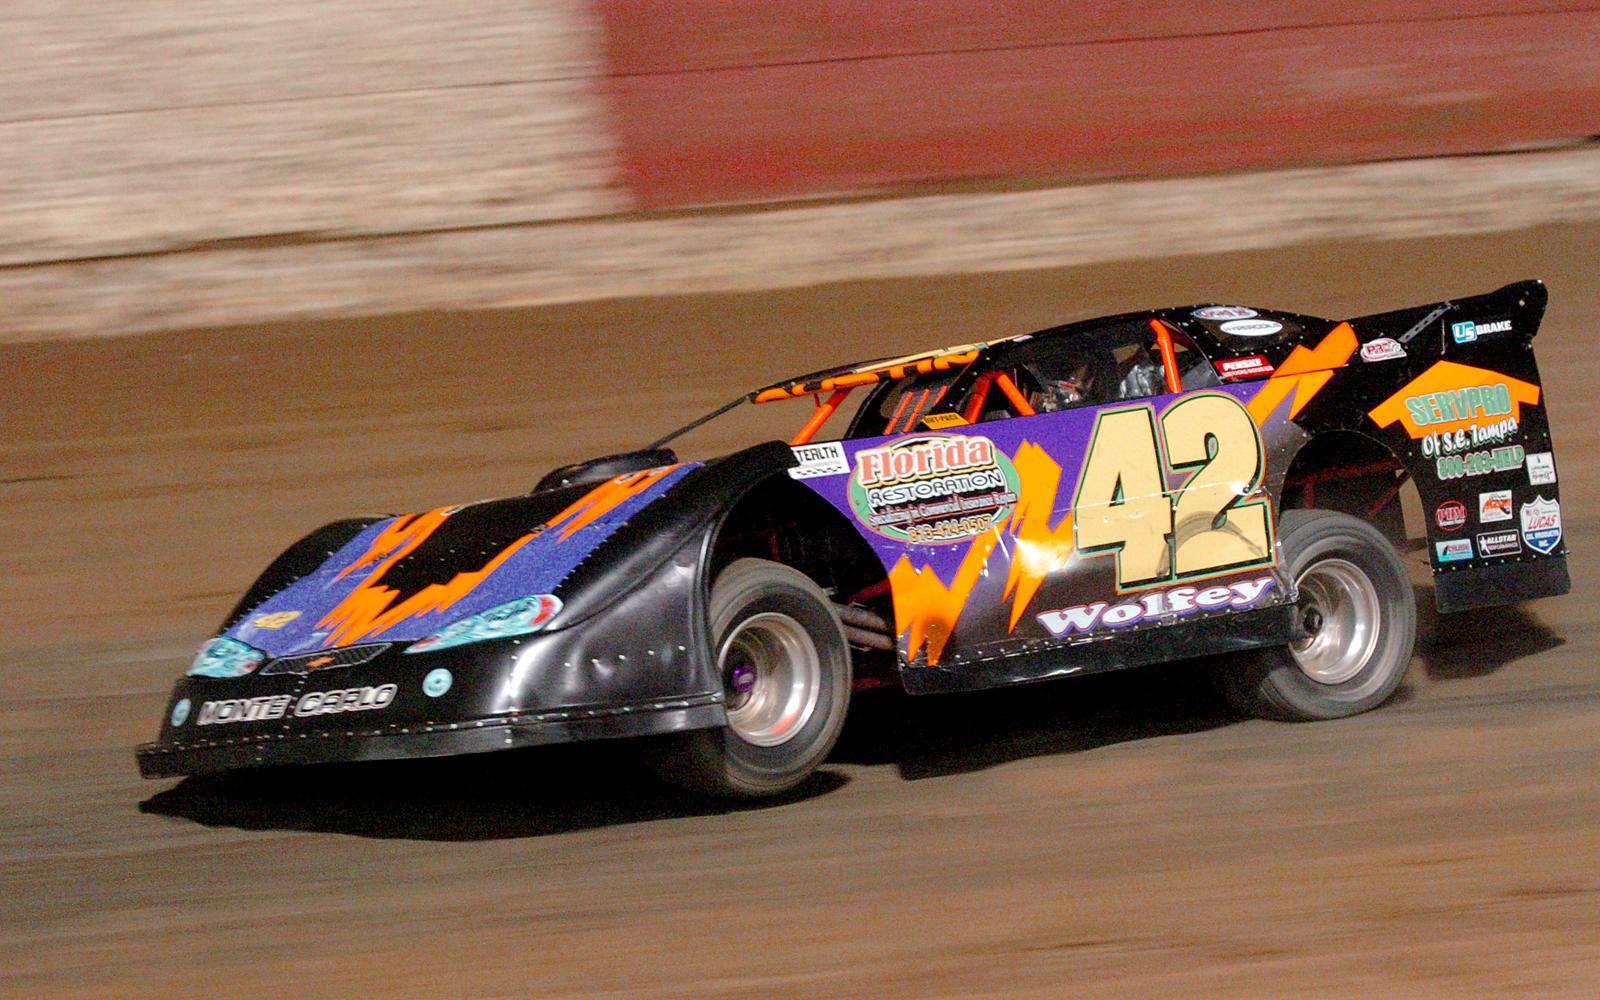 East Bay Raceway Park - Stock Car Racing - 2007 Winternationals - Florida USA, by Wayne Paulo